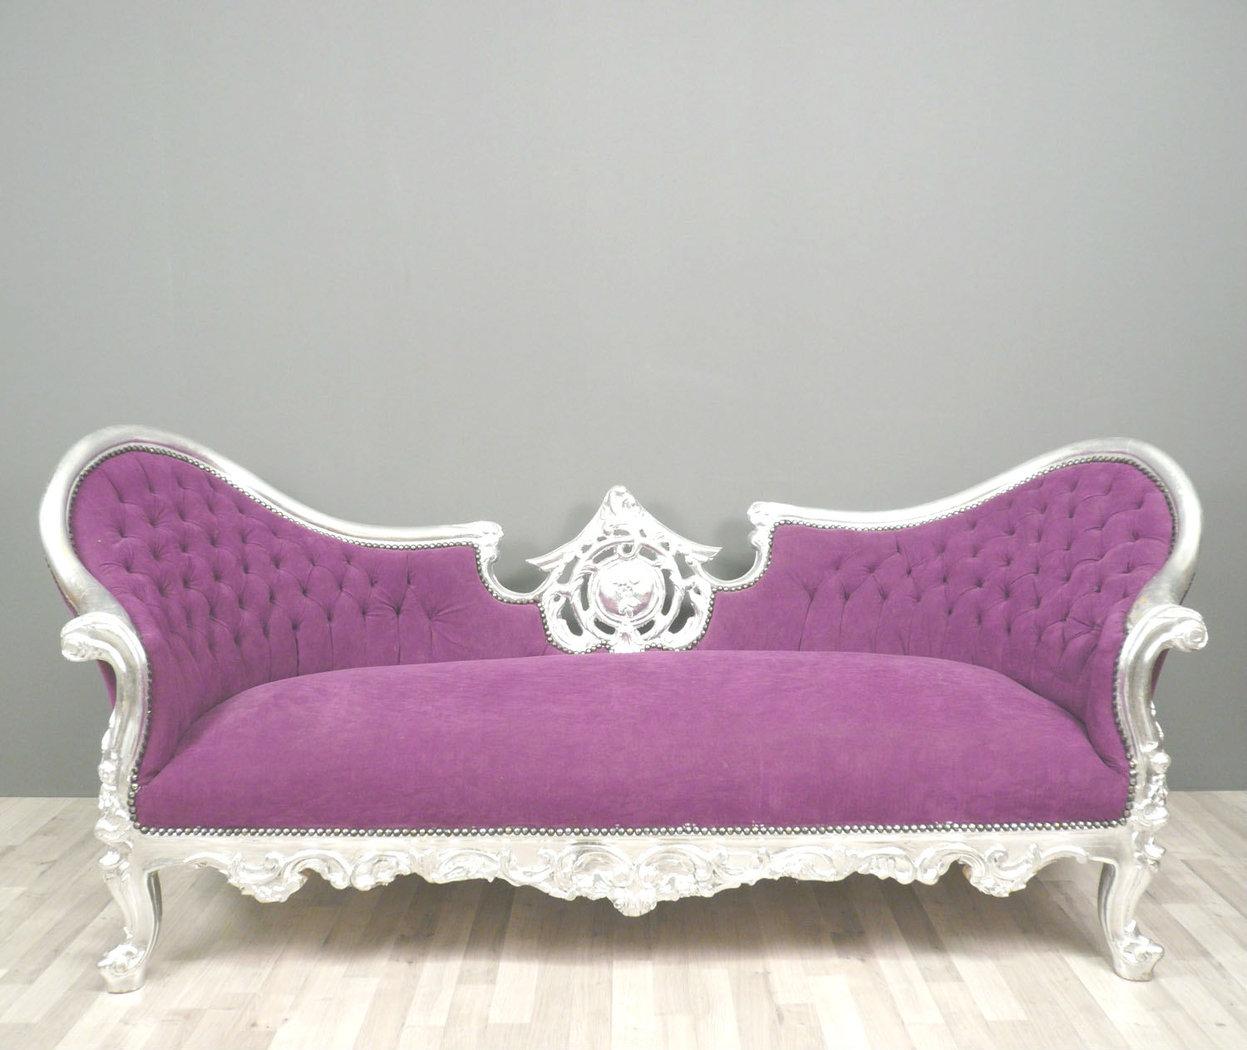 divano viola barocca lampade tiffany. Black Bedroom Furniture Sets. Home Design Ideas